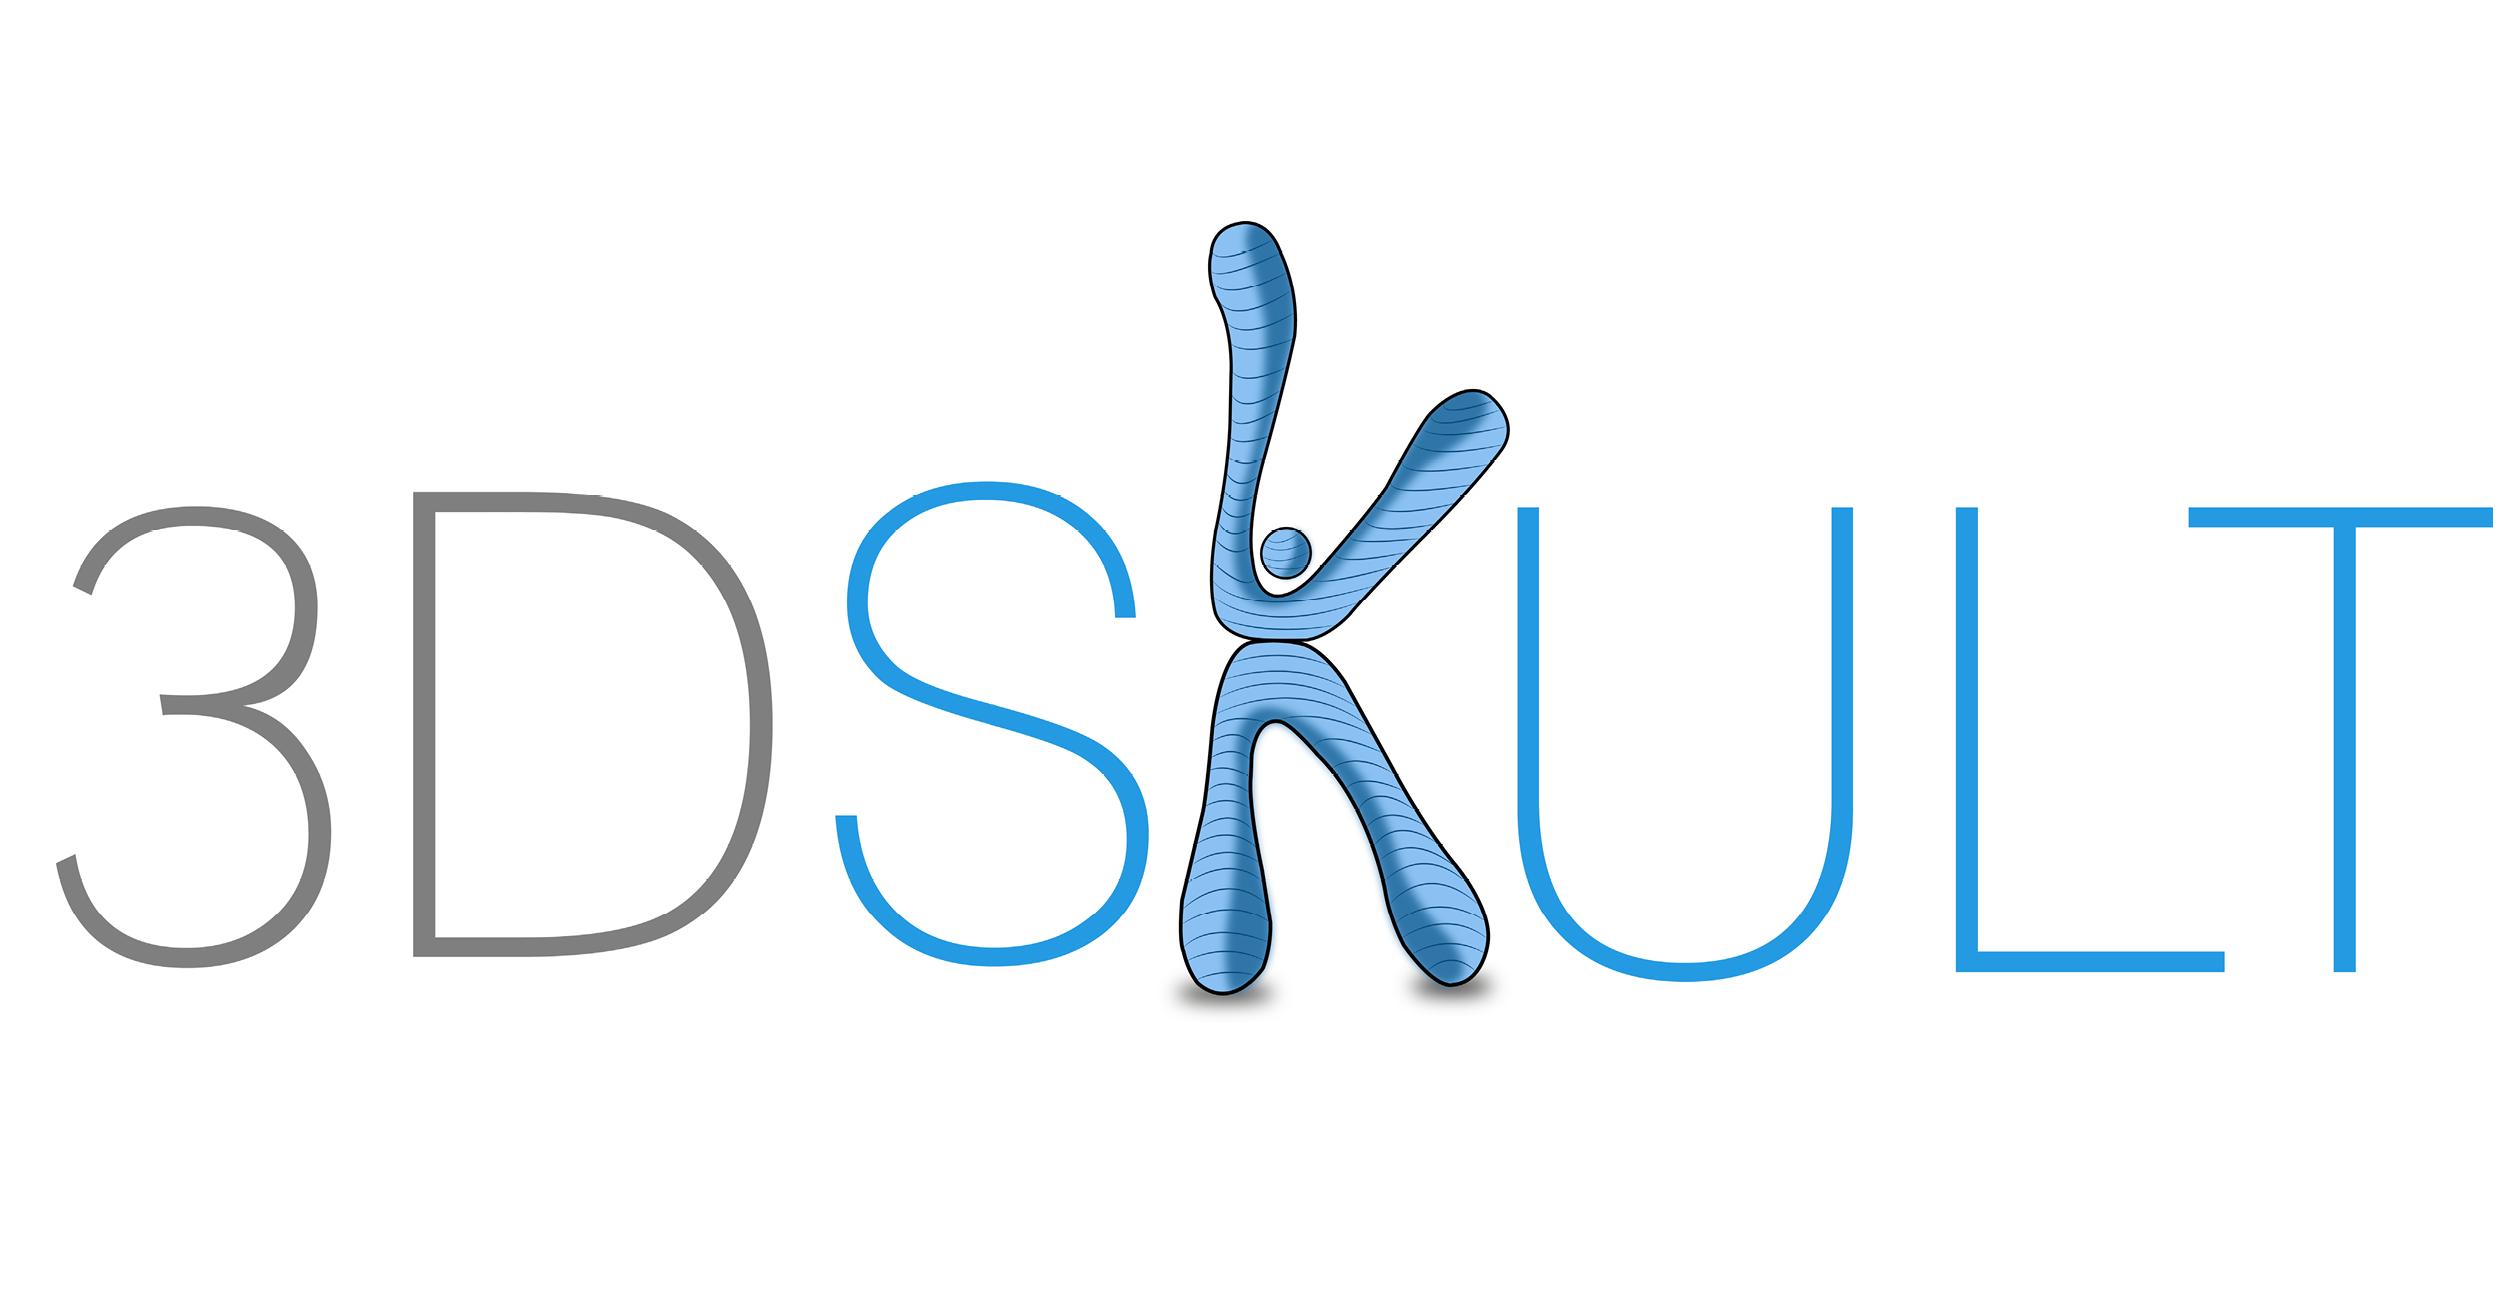 3dskult_logo web